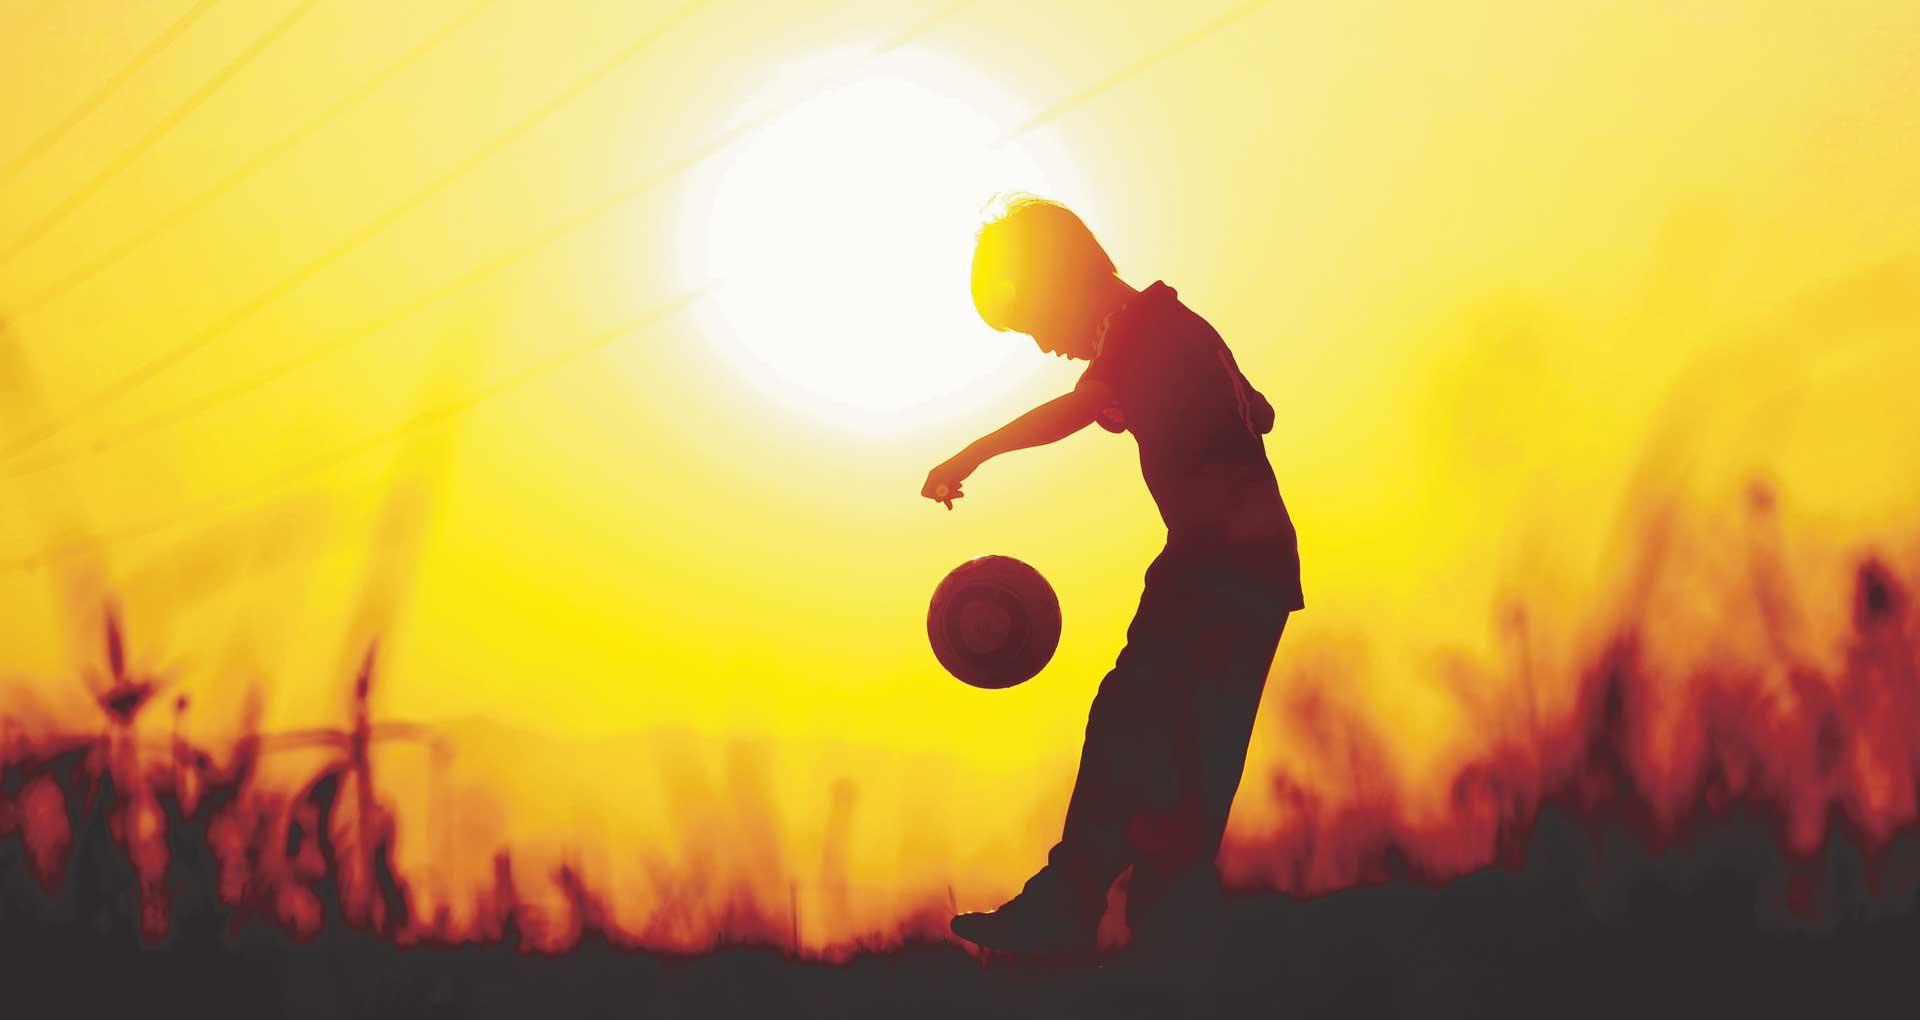 boy in sunset